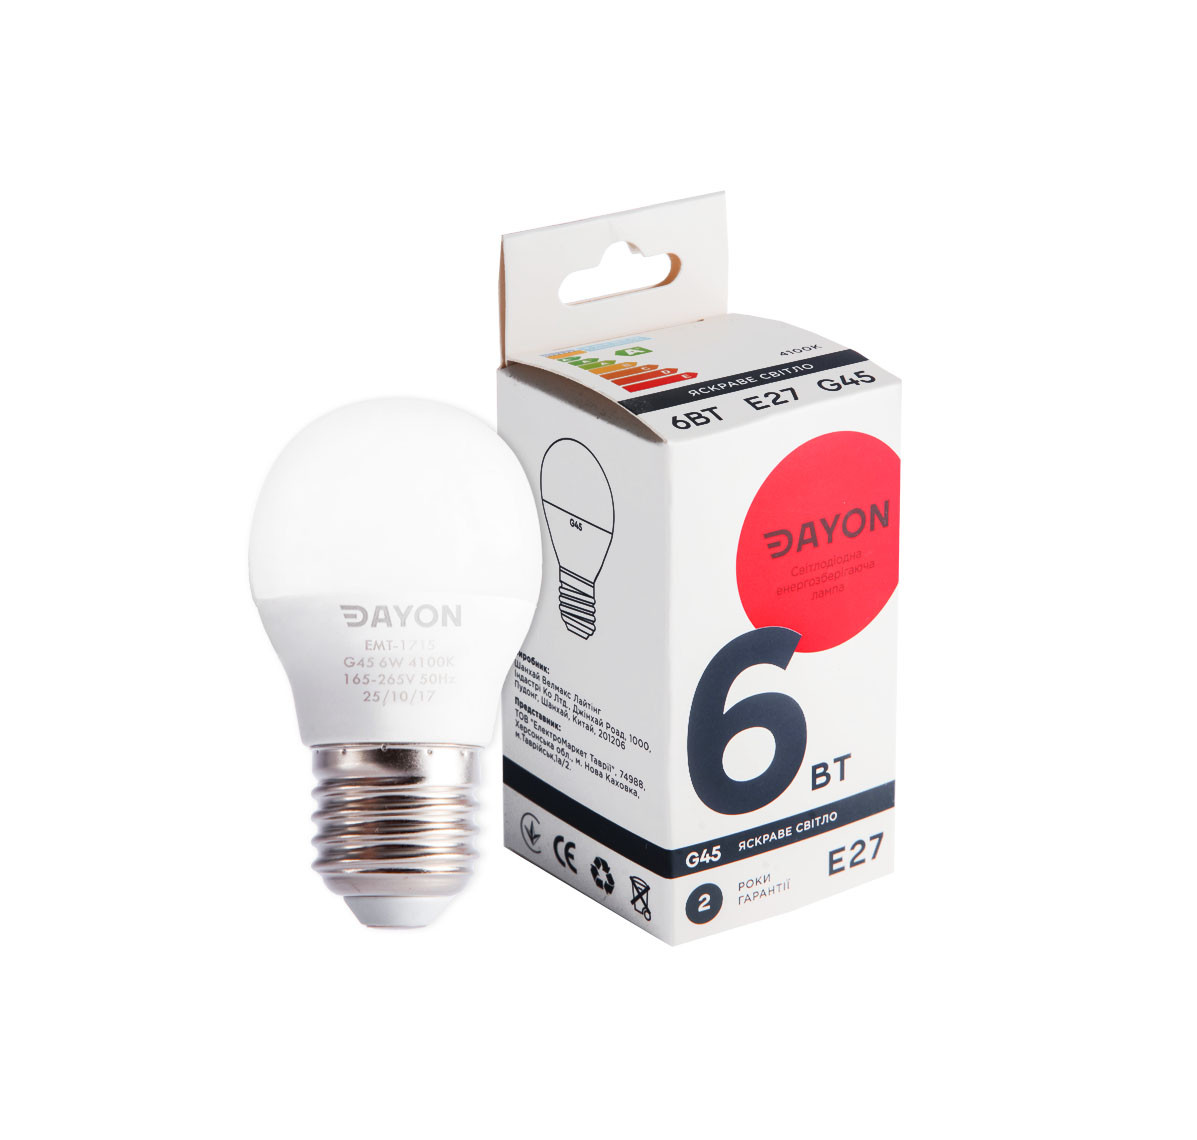 Светодиодная лампа DAYON EMT-1716 G45 6W 4100K E27